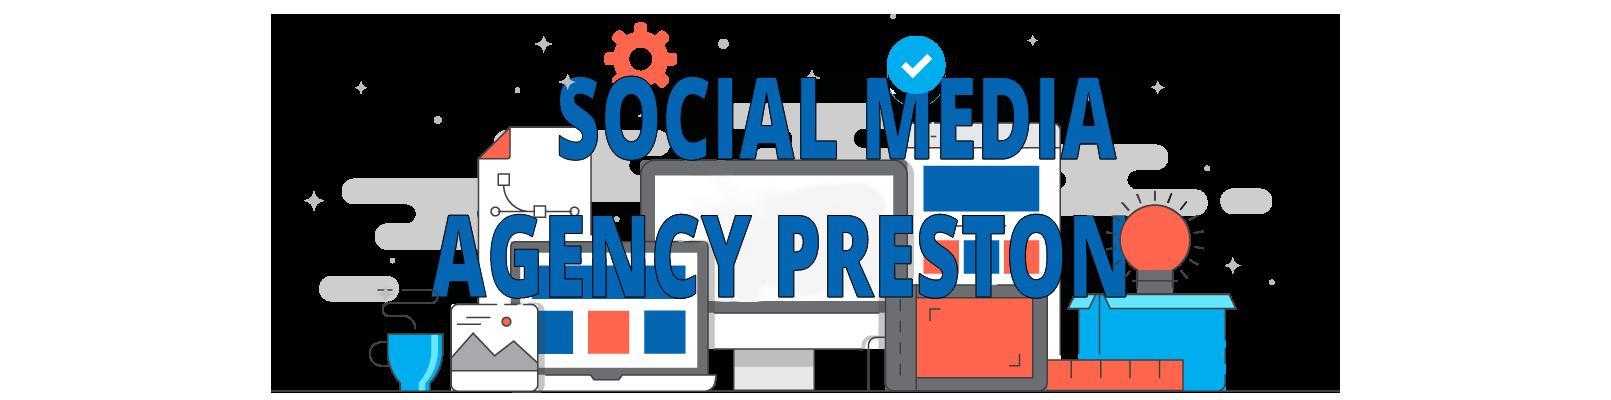 seek social social media agency preston header with transparent background